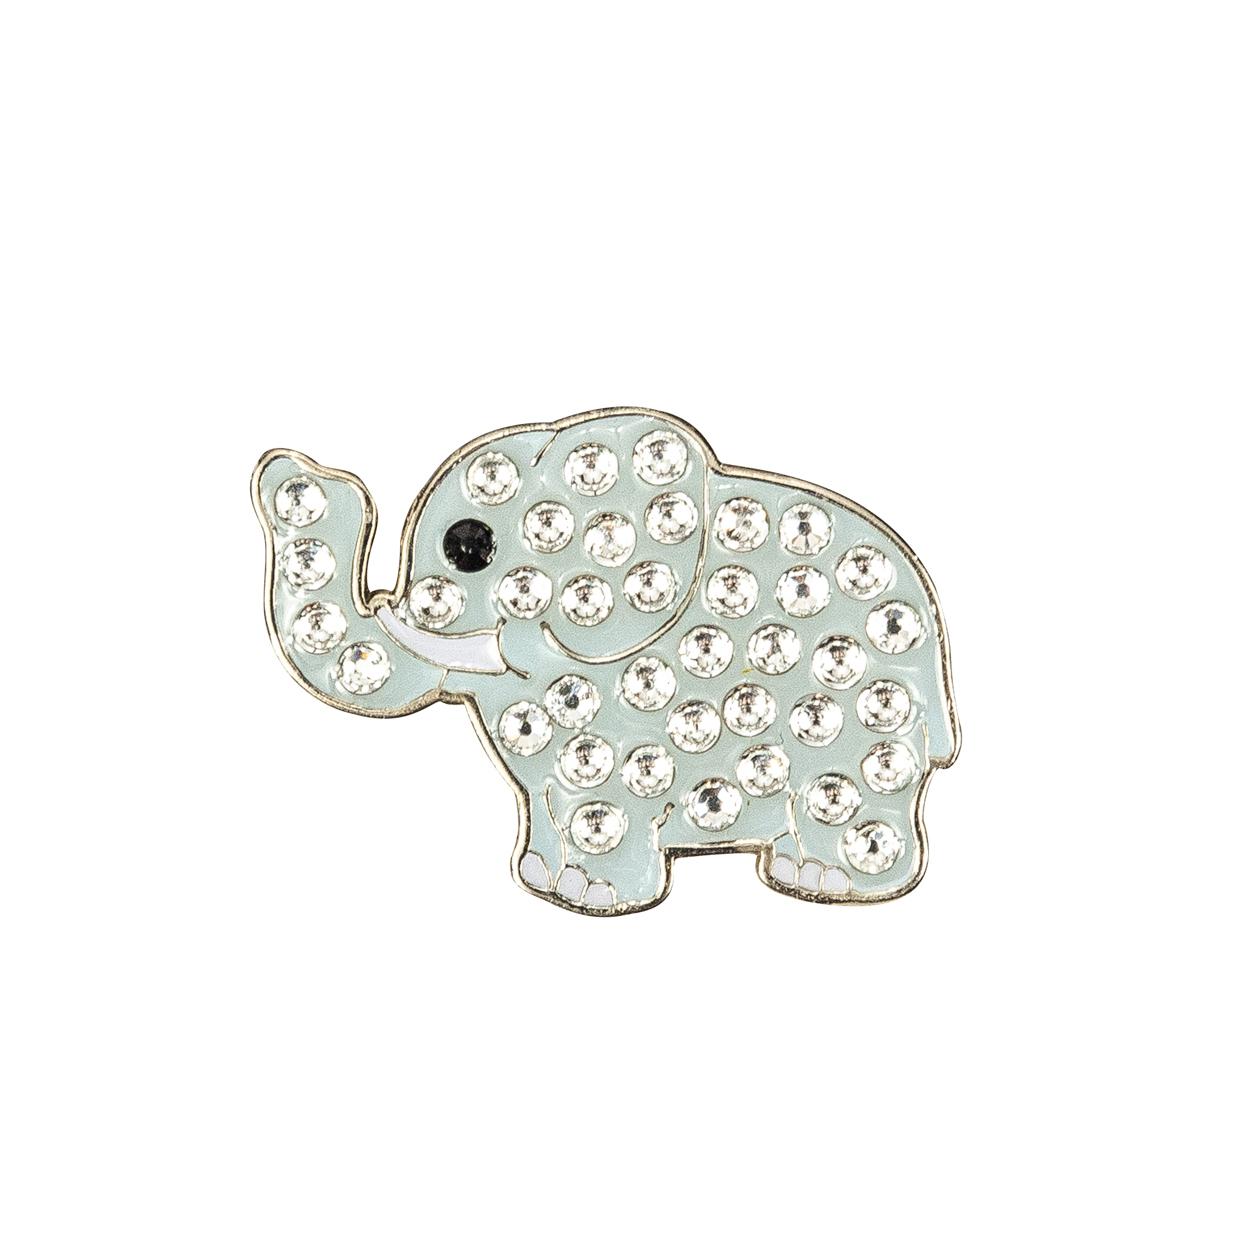 113. Elephant